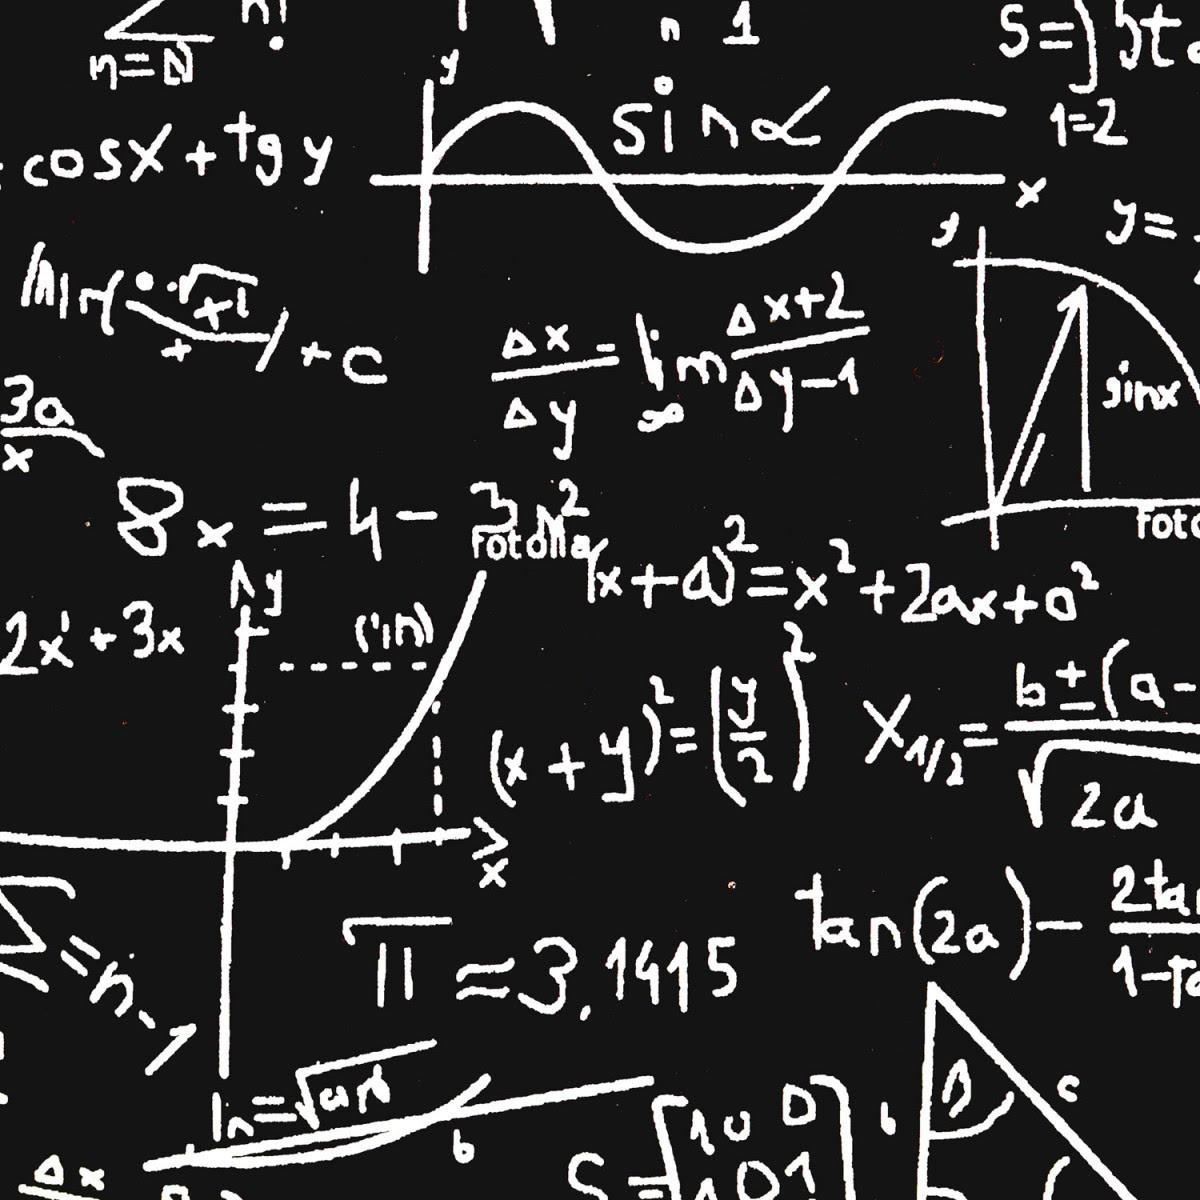 http://www.avecpassion.fr/4581-thickbox/papier-indien-noir-motif-blanc-maths.jpg